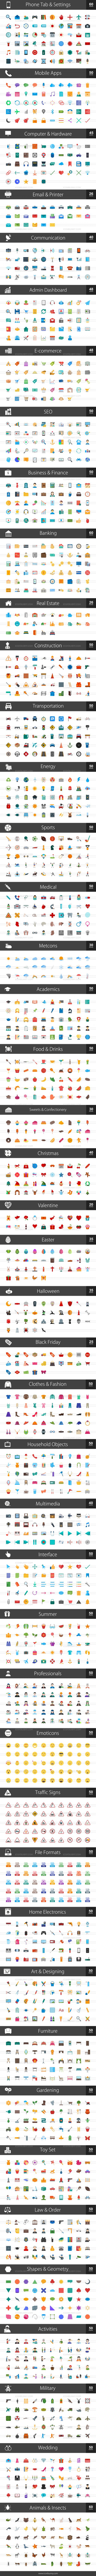 2070 Flat Multicolor cons Bundle - Preview - IconBunny